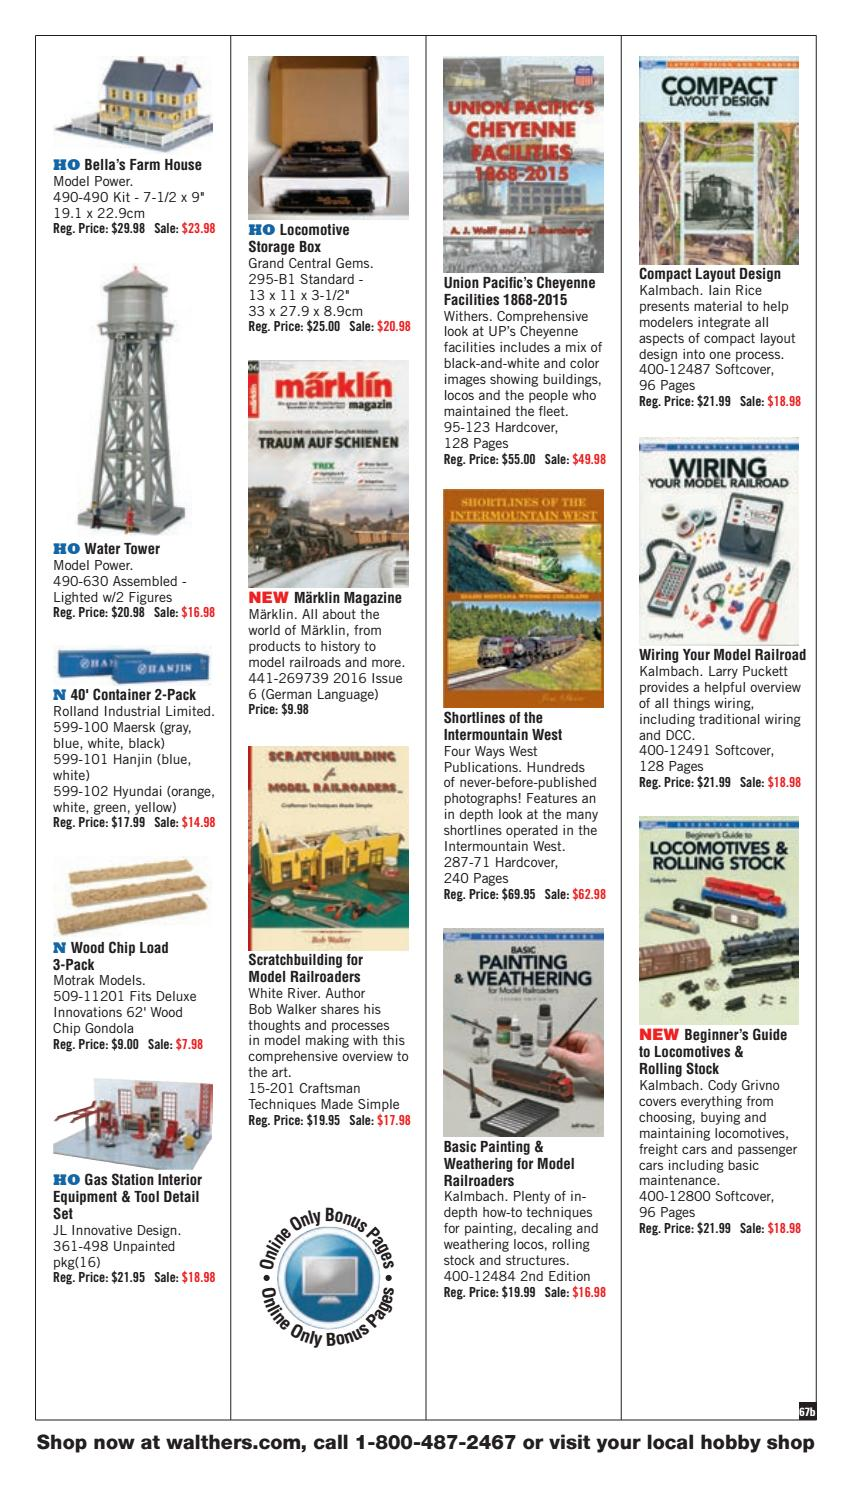 HO Gas Station Interior Equipment /& Tool Detail Set